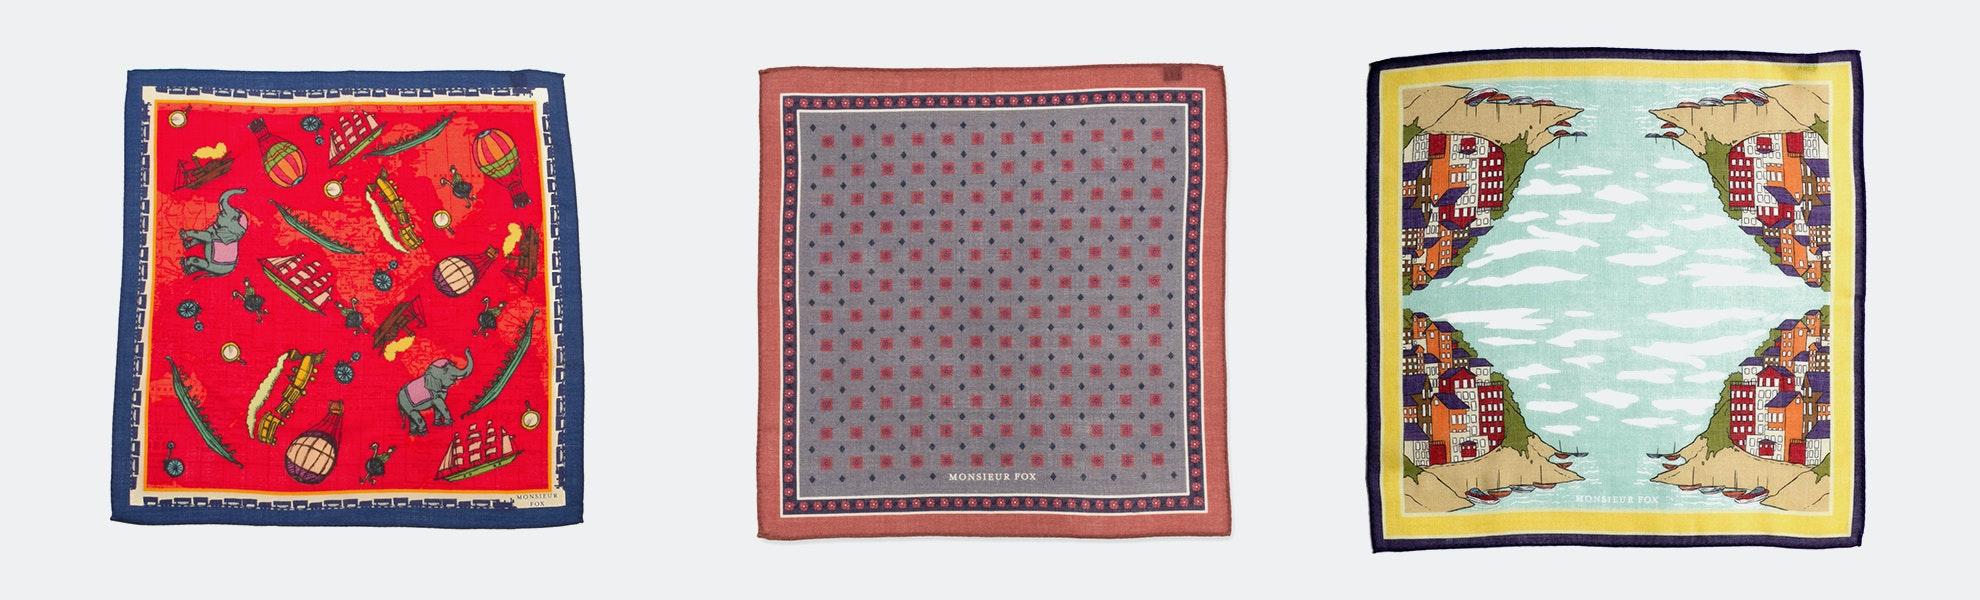 Monsieur Fox Pocket Squares & Scarves